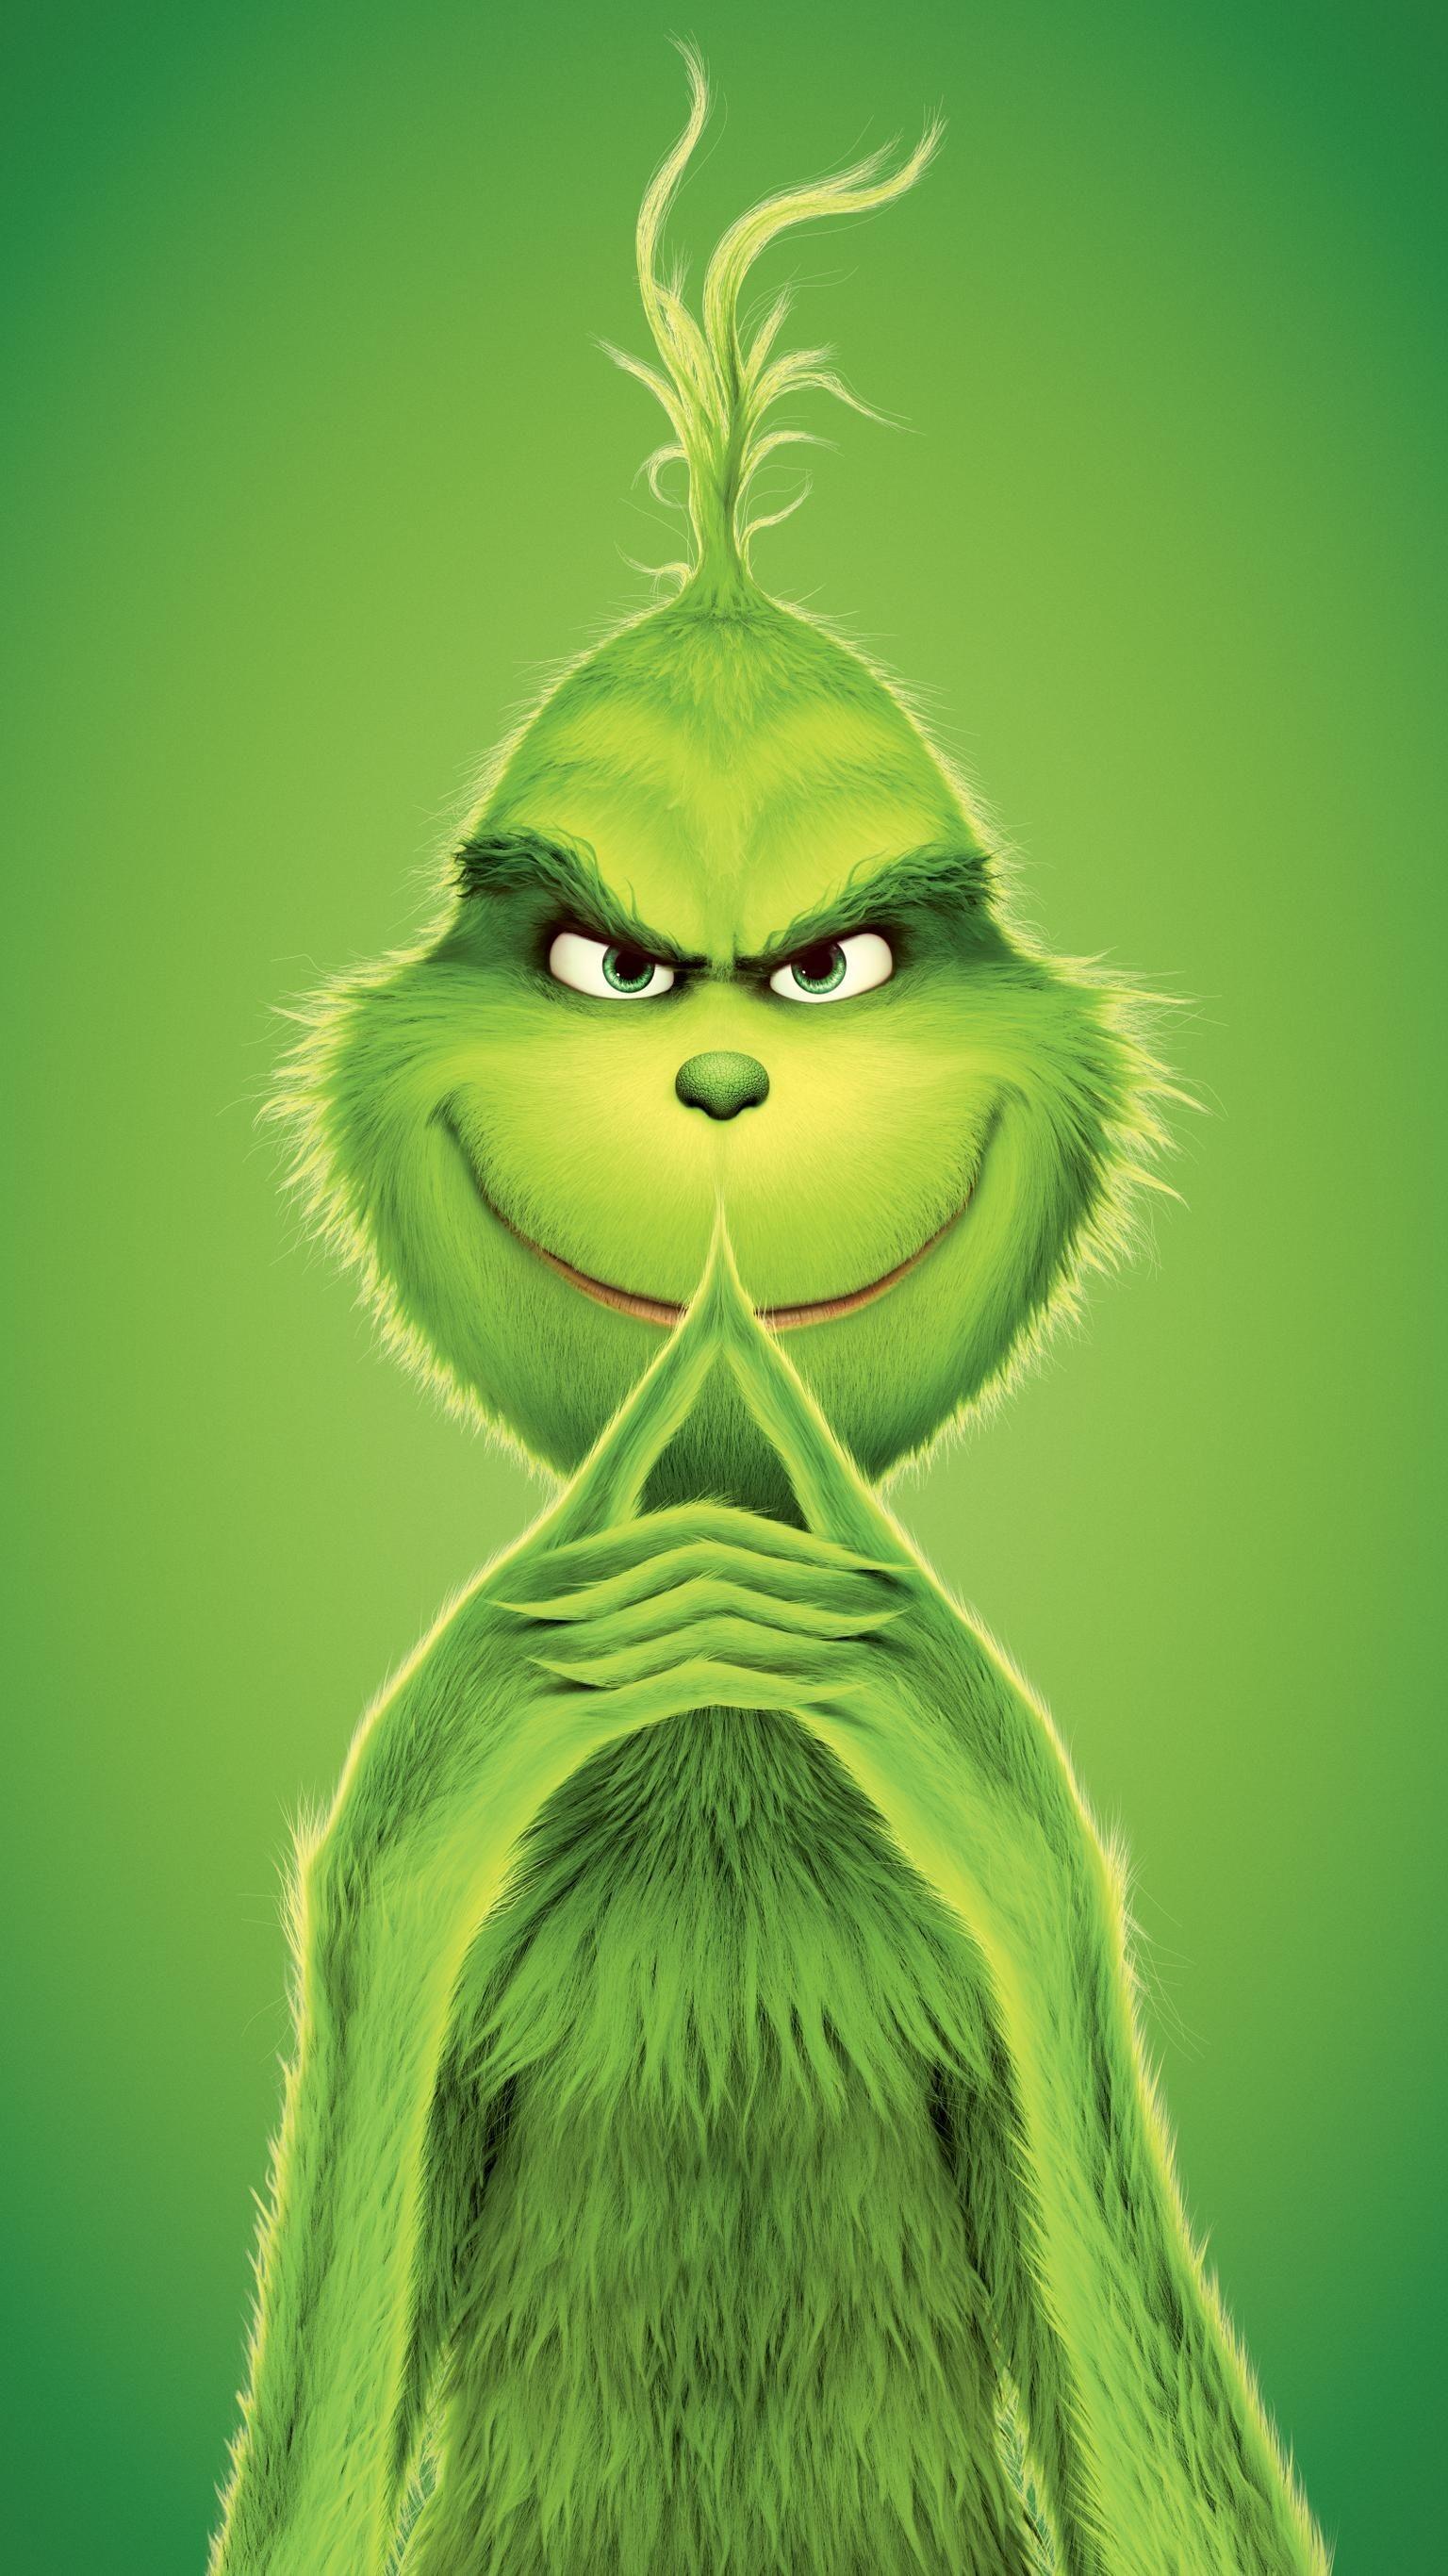 1536x2732 The Grinch Phone Wallpaper   Cartoon Grinch 3124189 1536x2732